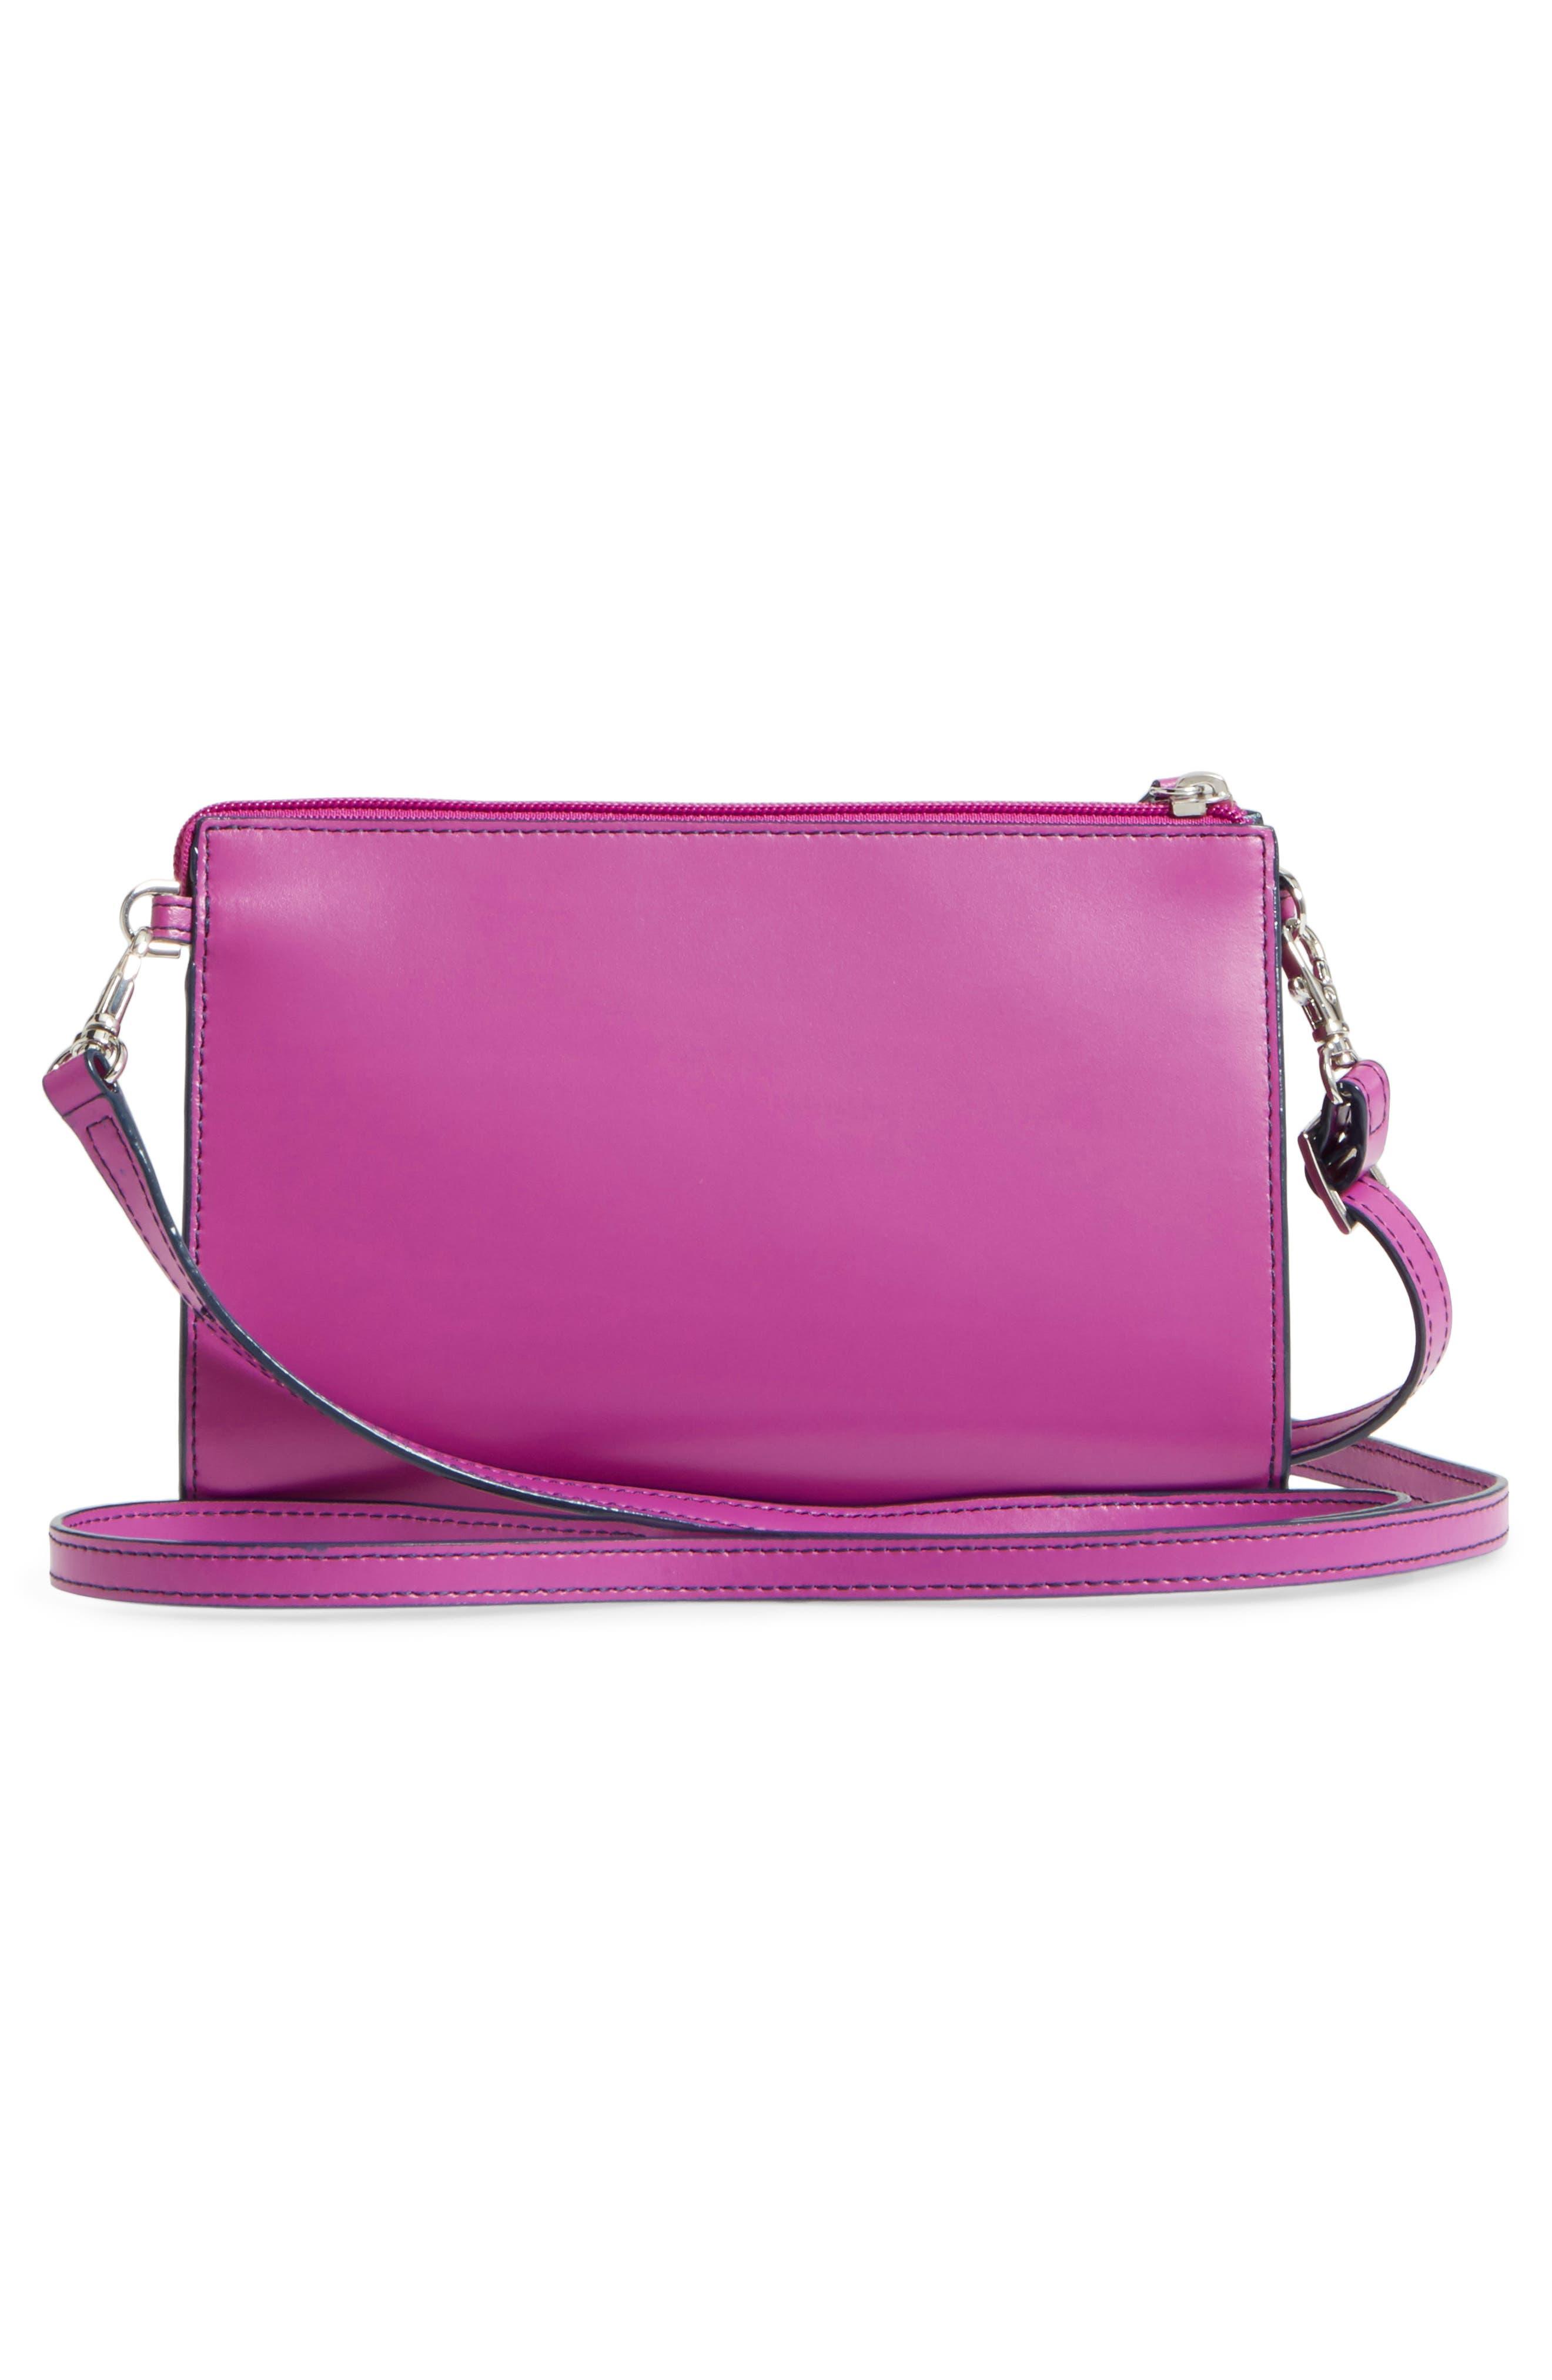 Alternate Image 3  - LODIS Audrey Under Lock & Key Vicky Convertible Leather Crossbody Bag